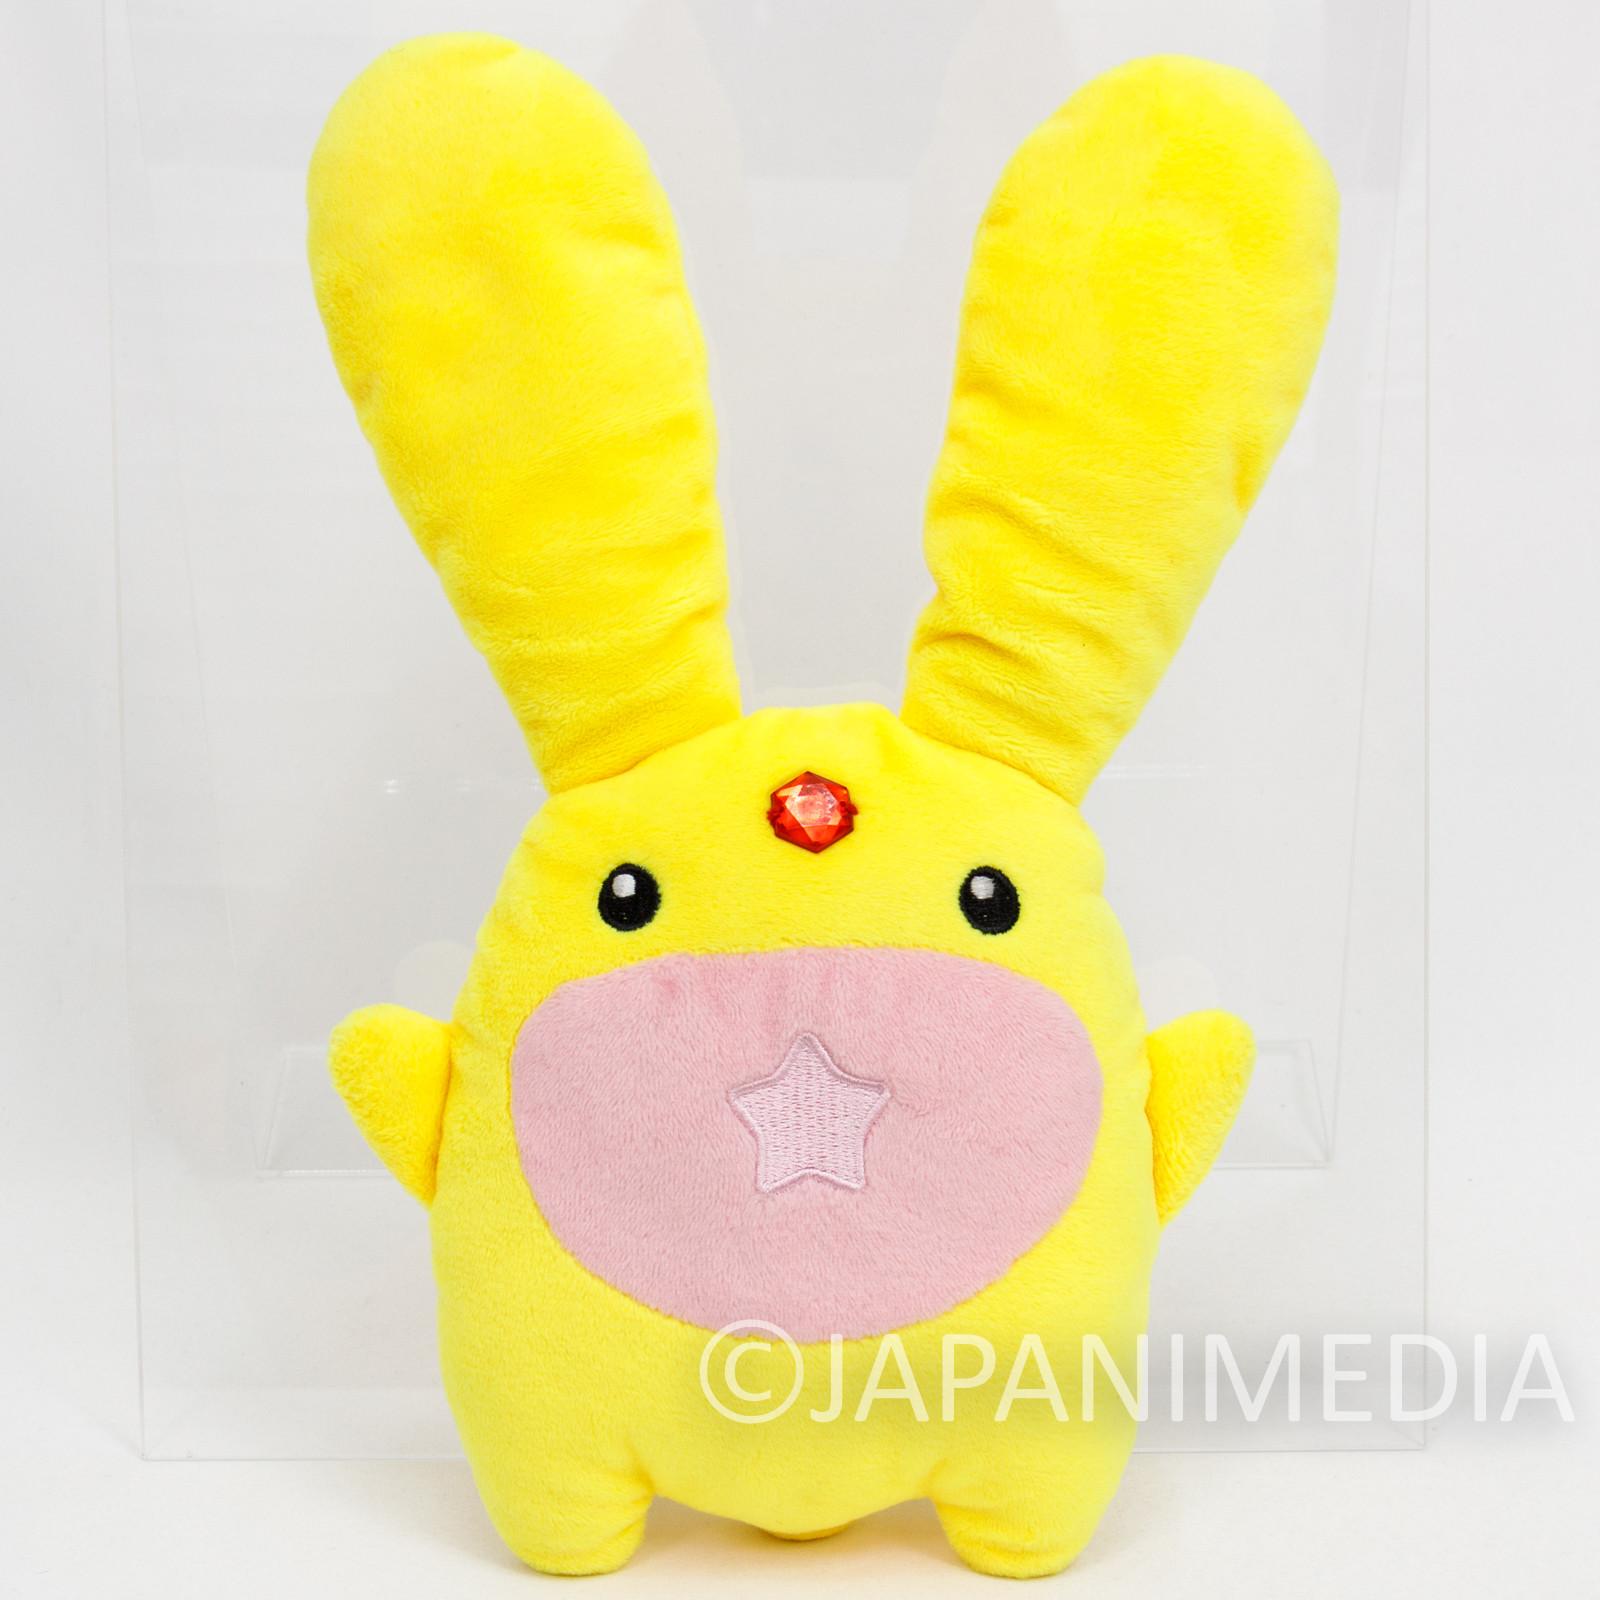 PUYO PUYO Carbuncle Plush Doll Pass Case JAPAN GAME